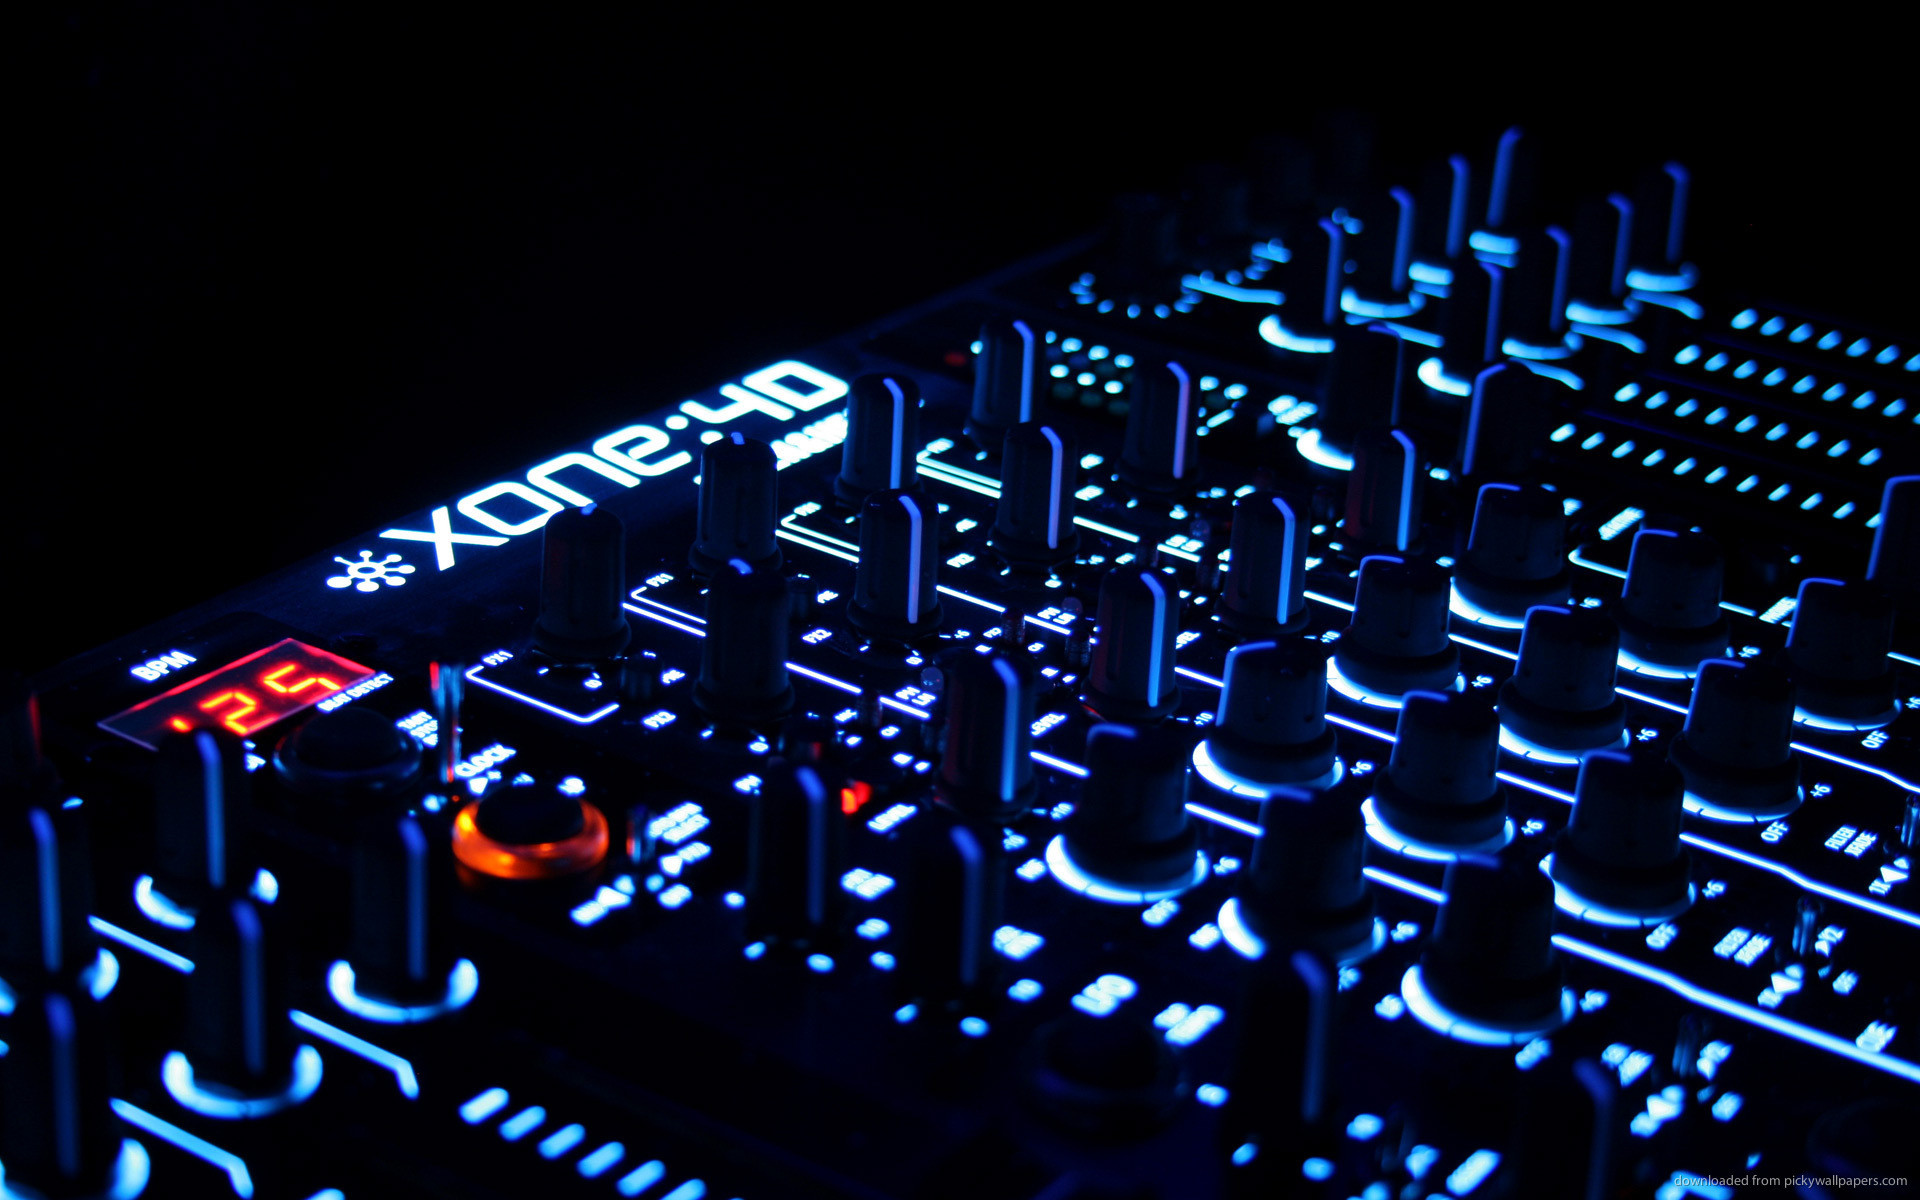 Music DJ Wallpapers HD – https://wallawy.com/music-dj